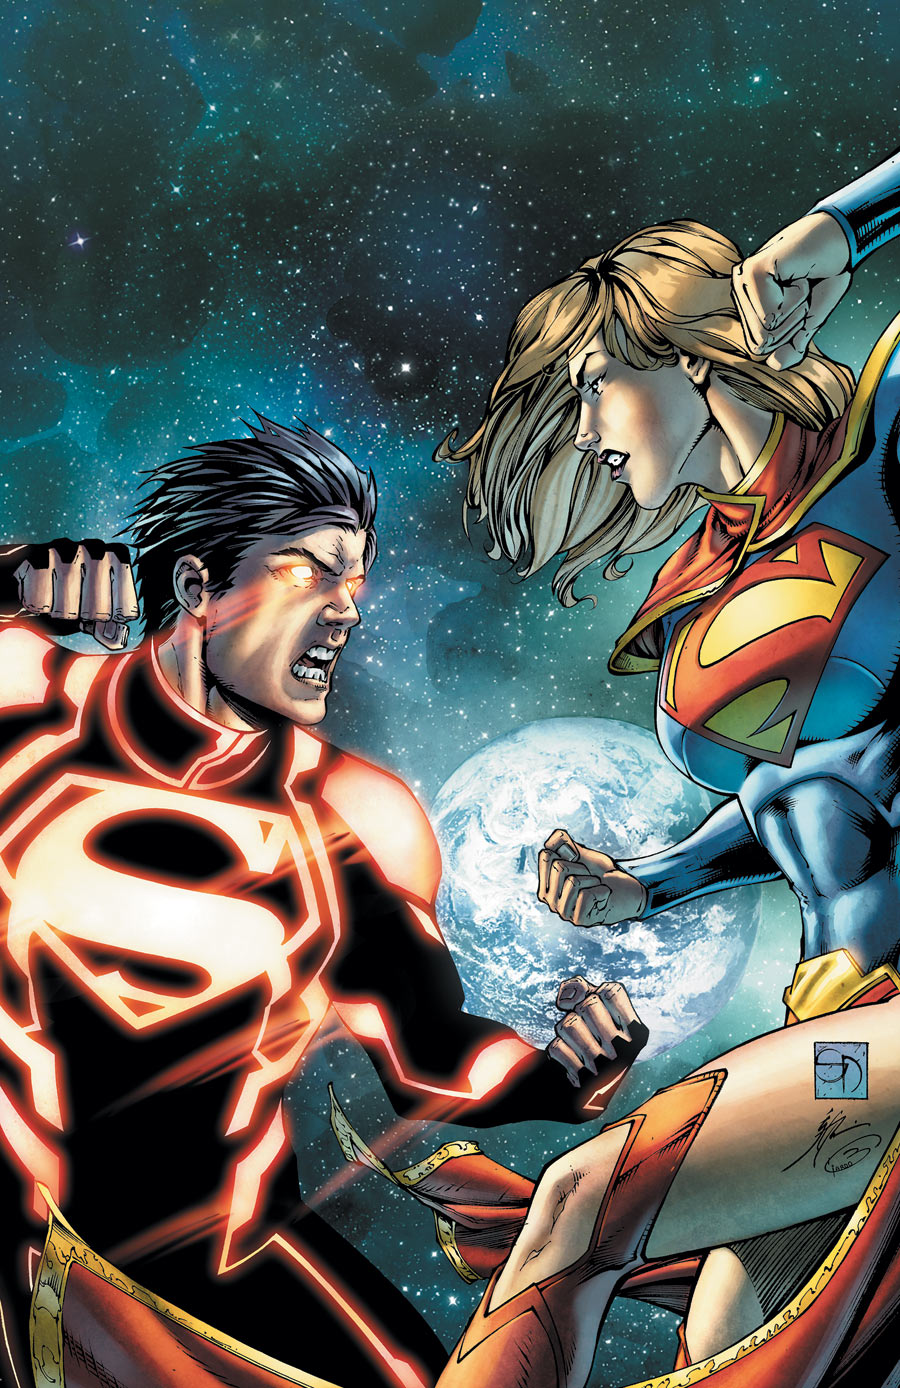 Superboy Vol 6 6 Textless.jpg